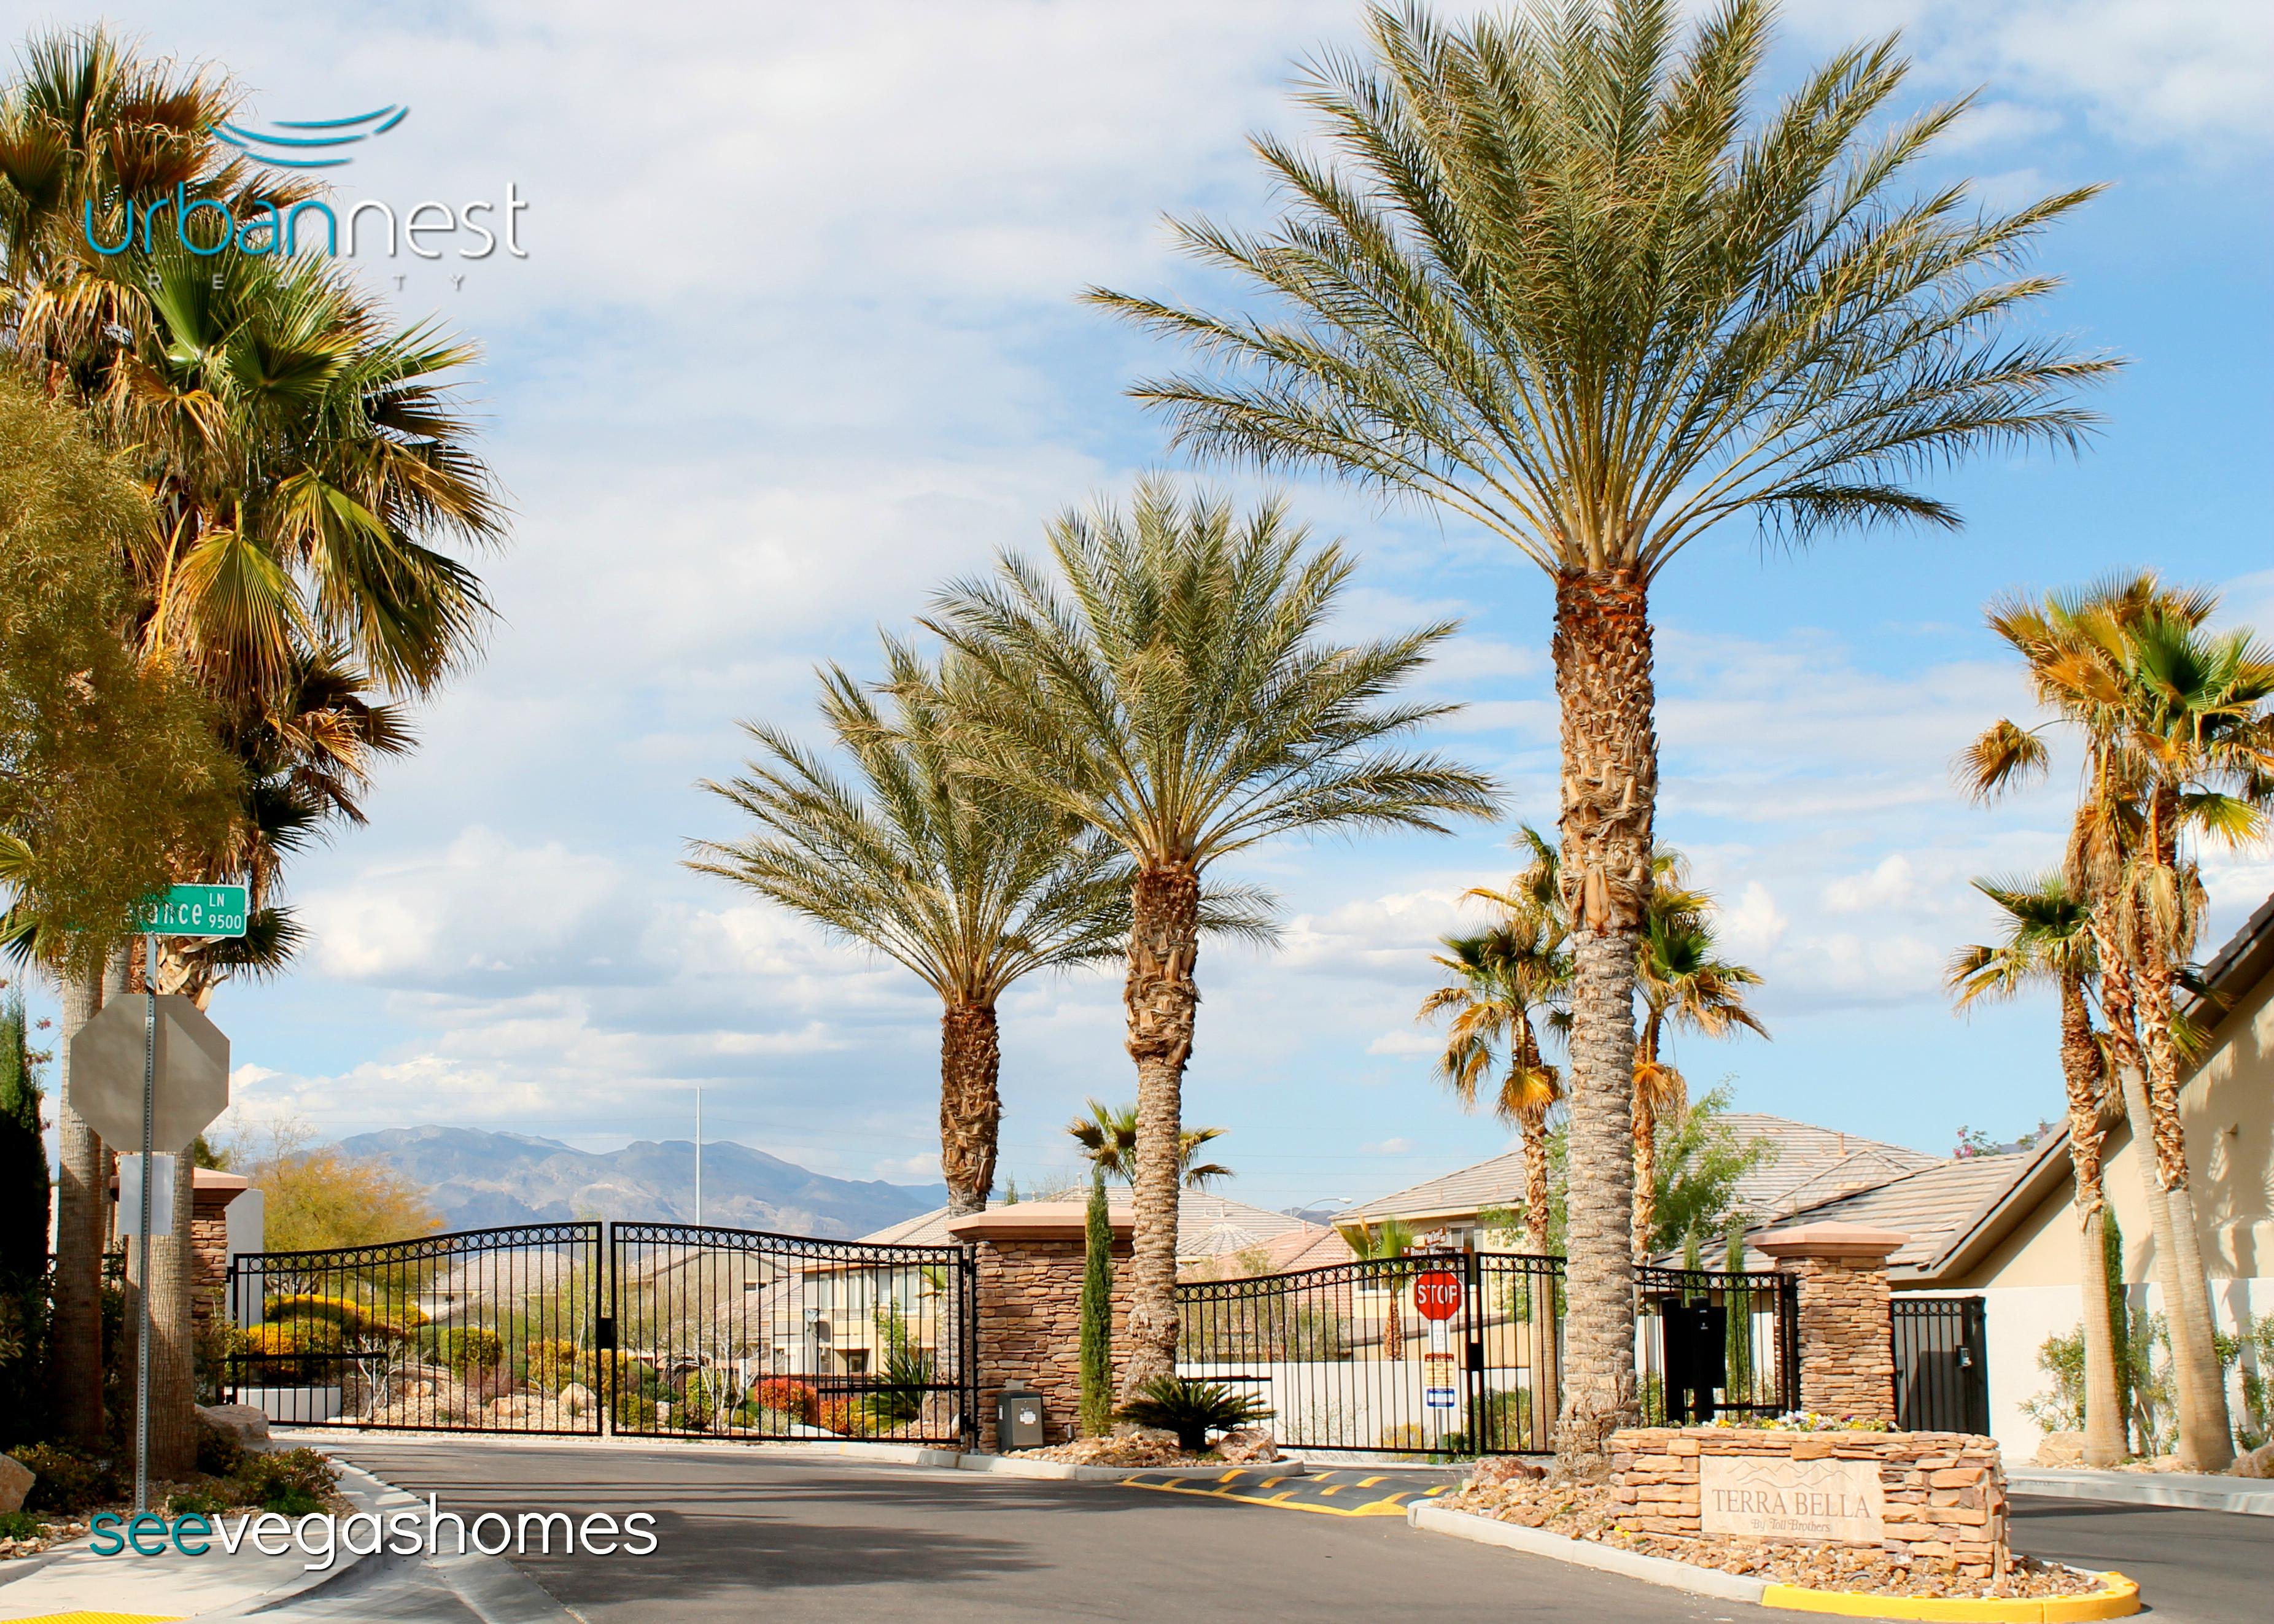 Terra Bella by Toll Brothers Las Vegas NV 89149 SeeVegasHomes